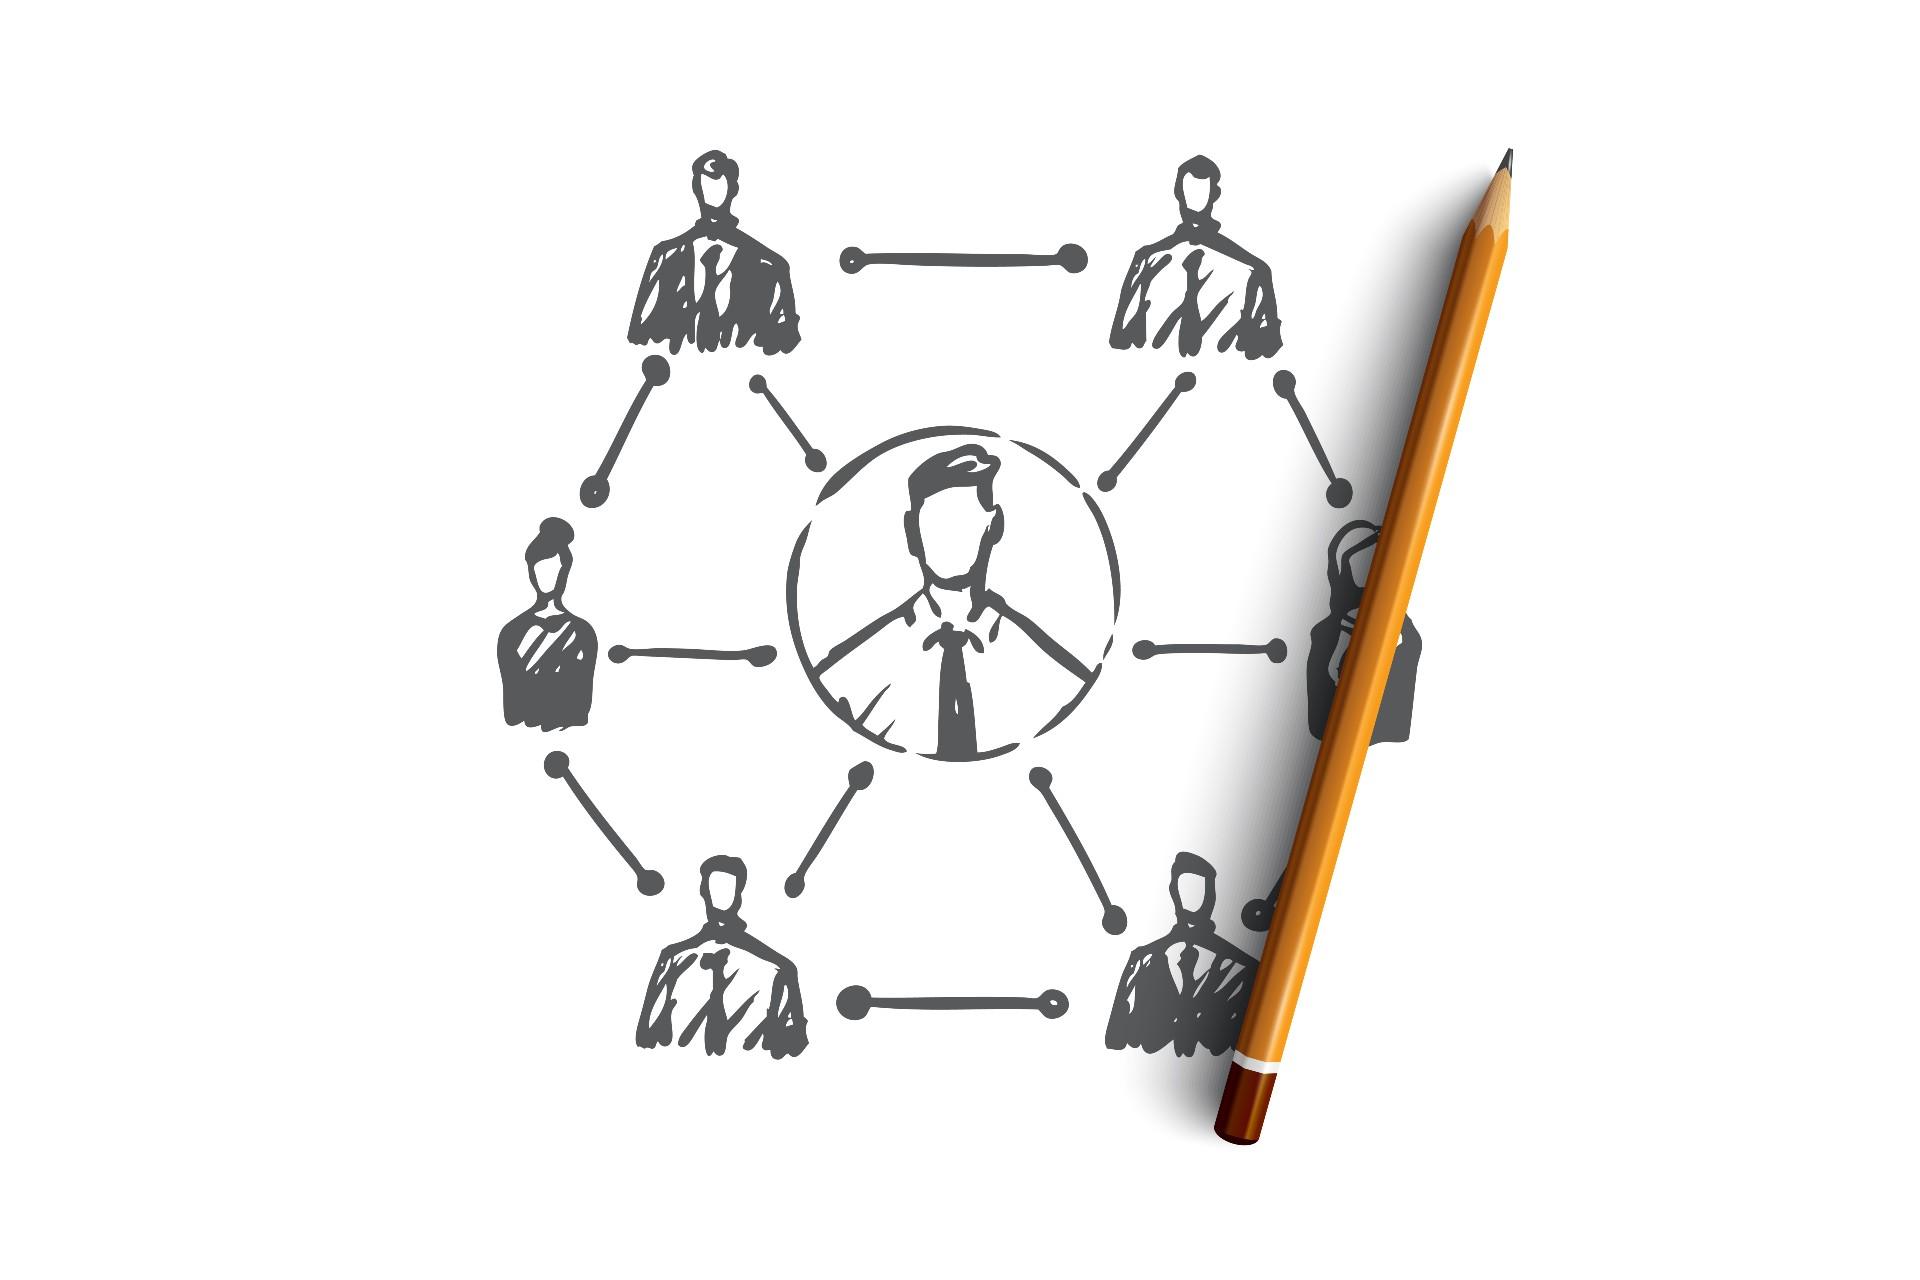 Novine.ba-Client Relationship Marketing